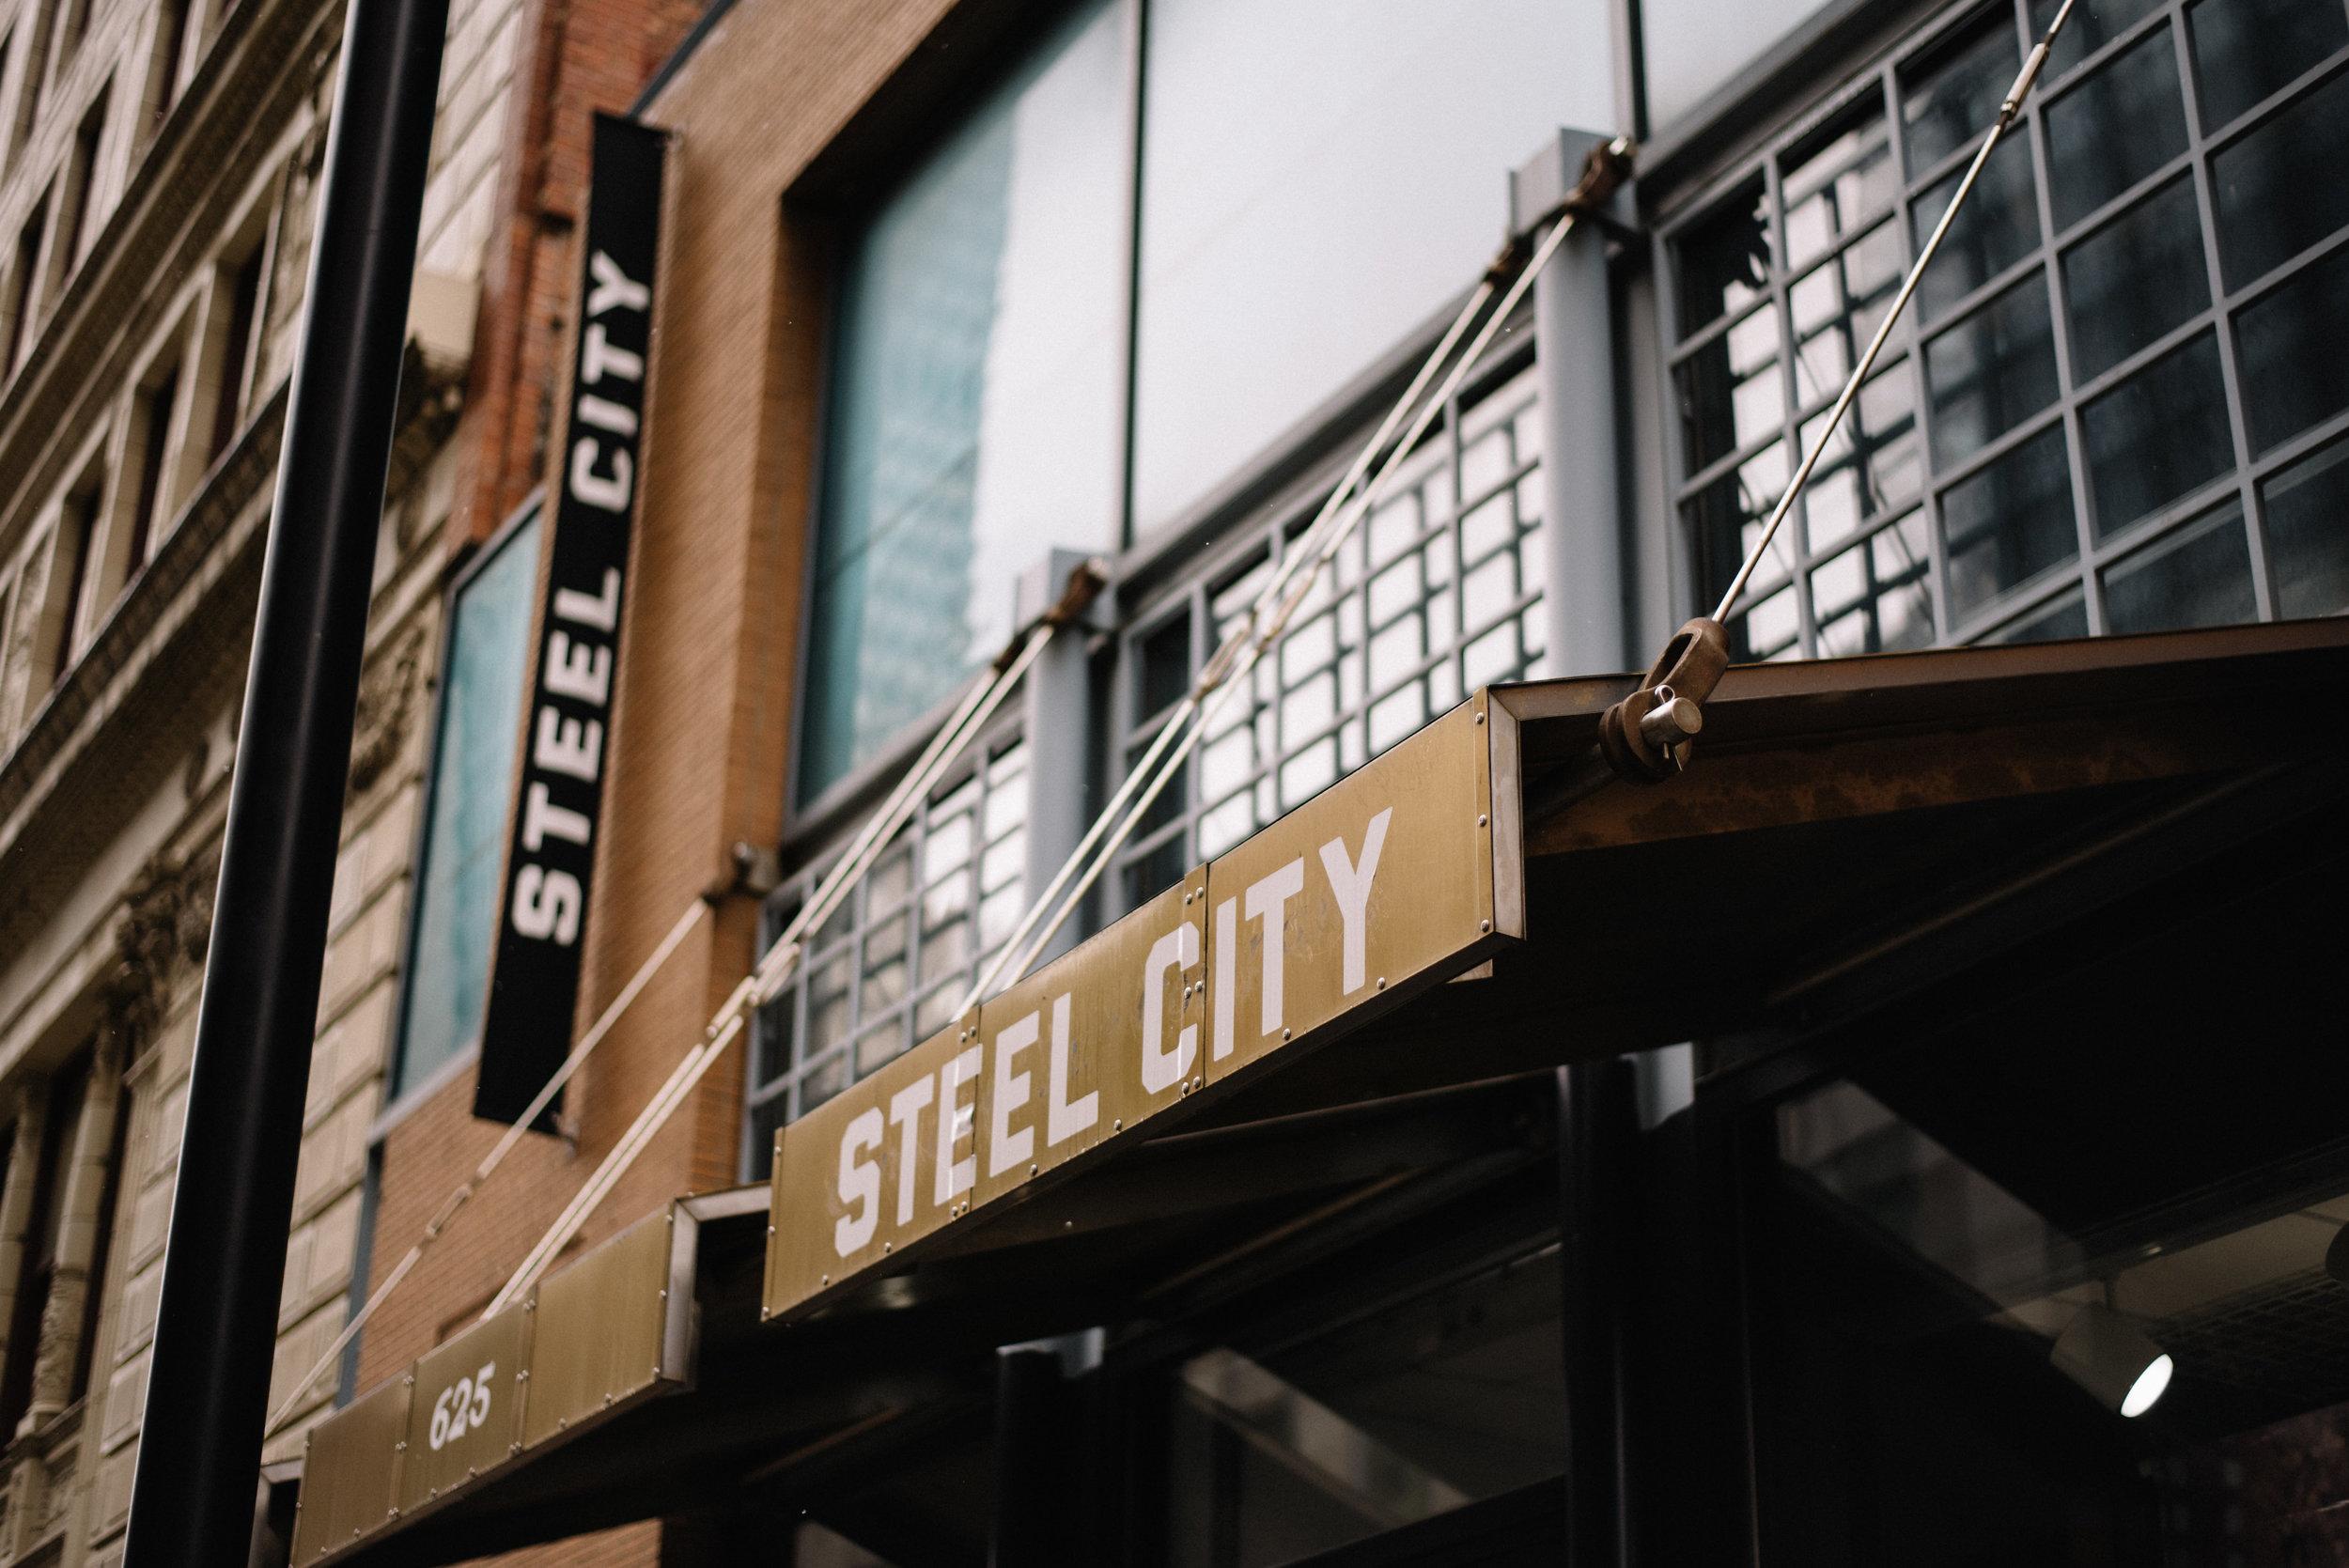 RCC_S412_SteelCity-1.jpg